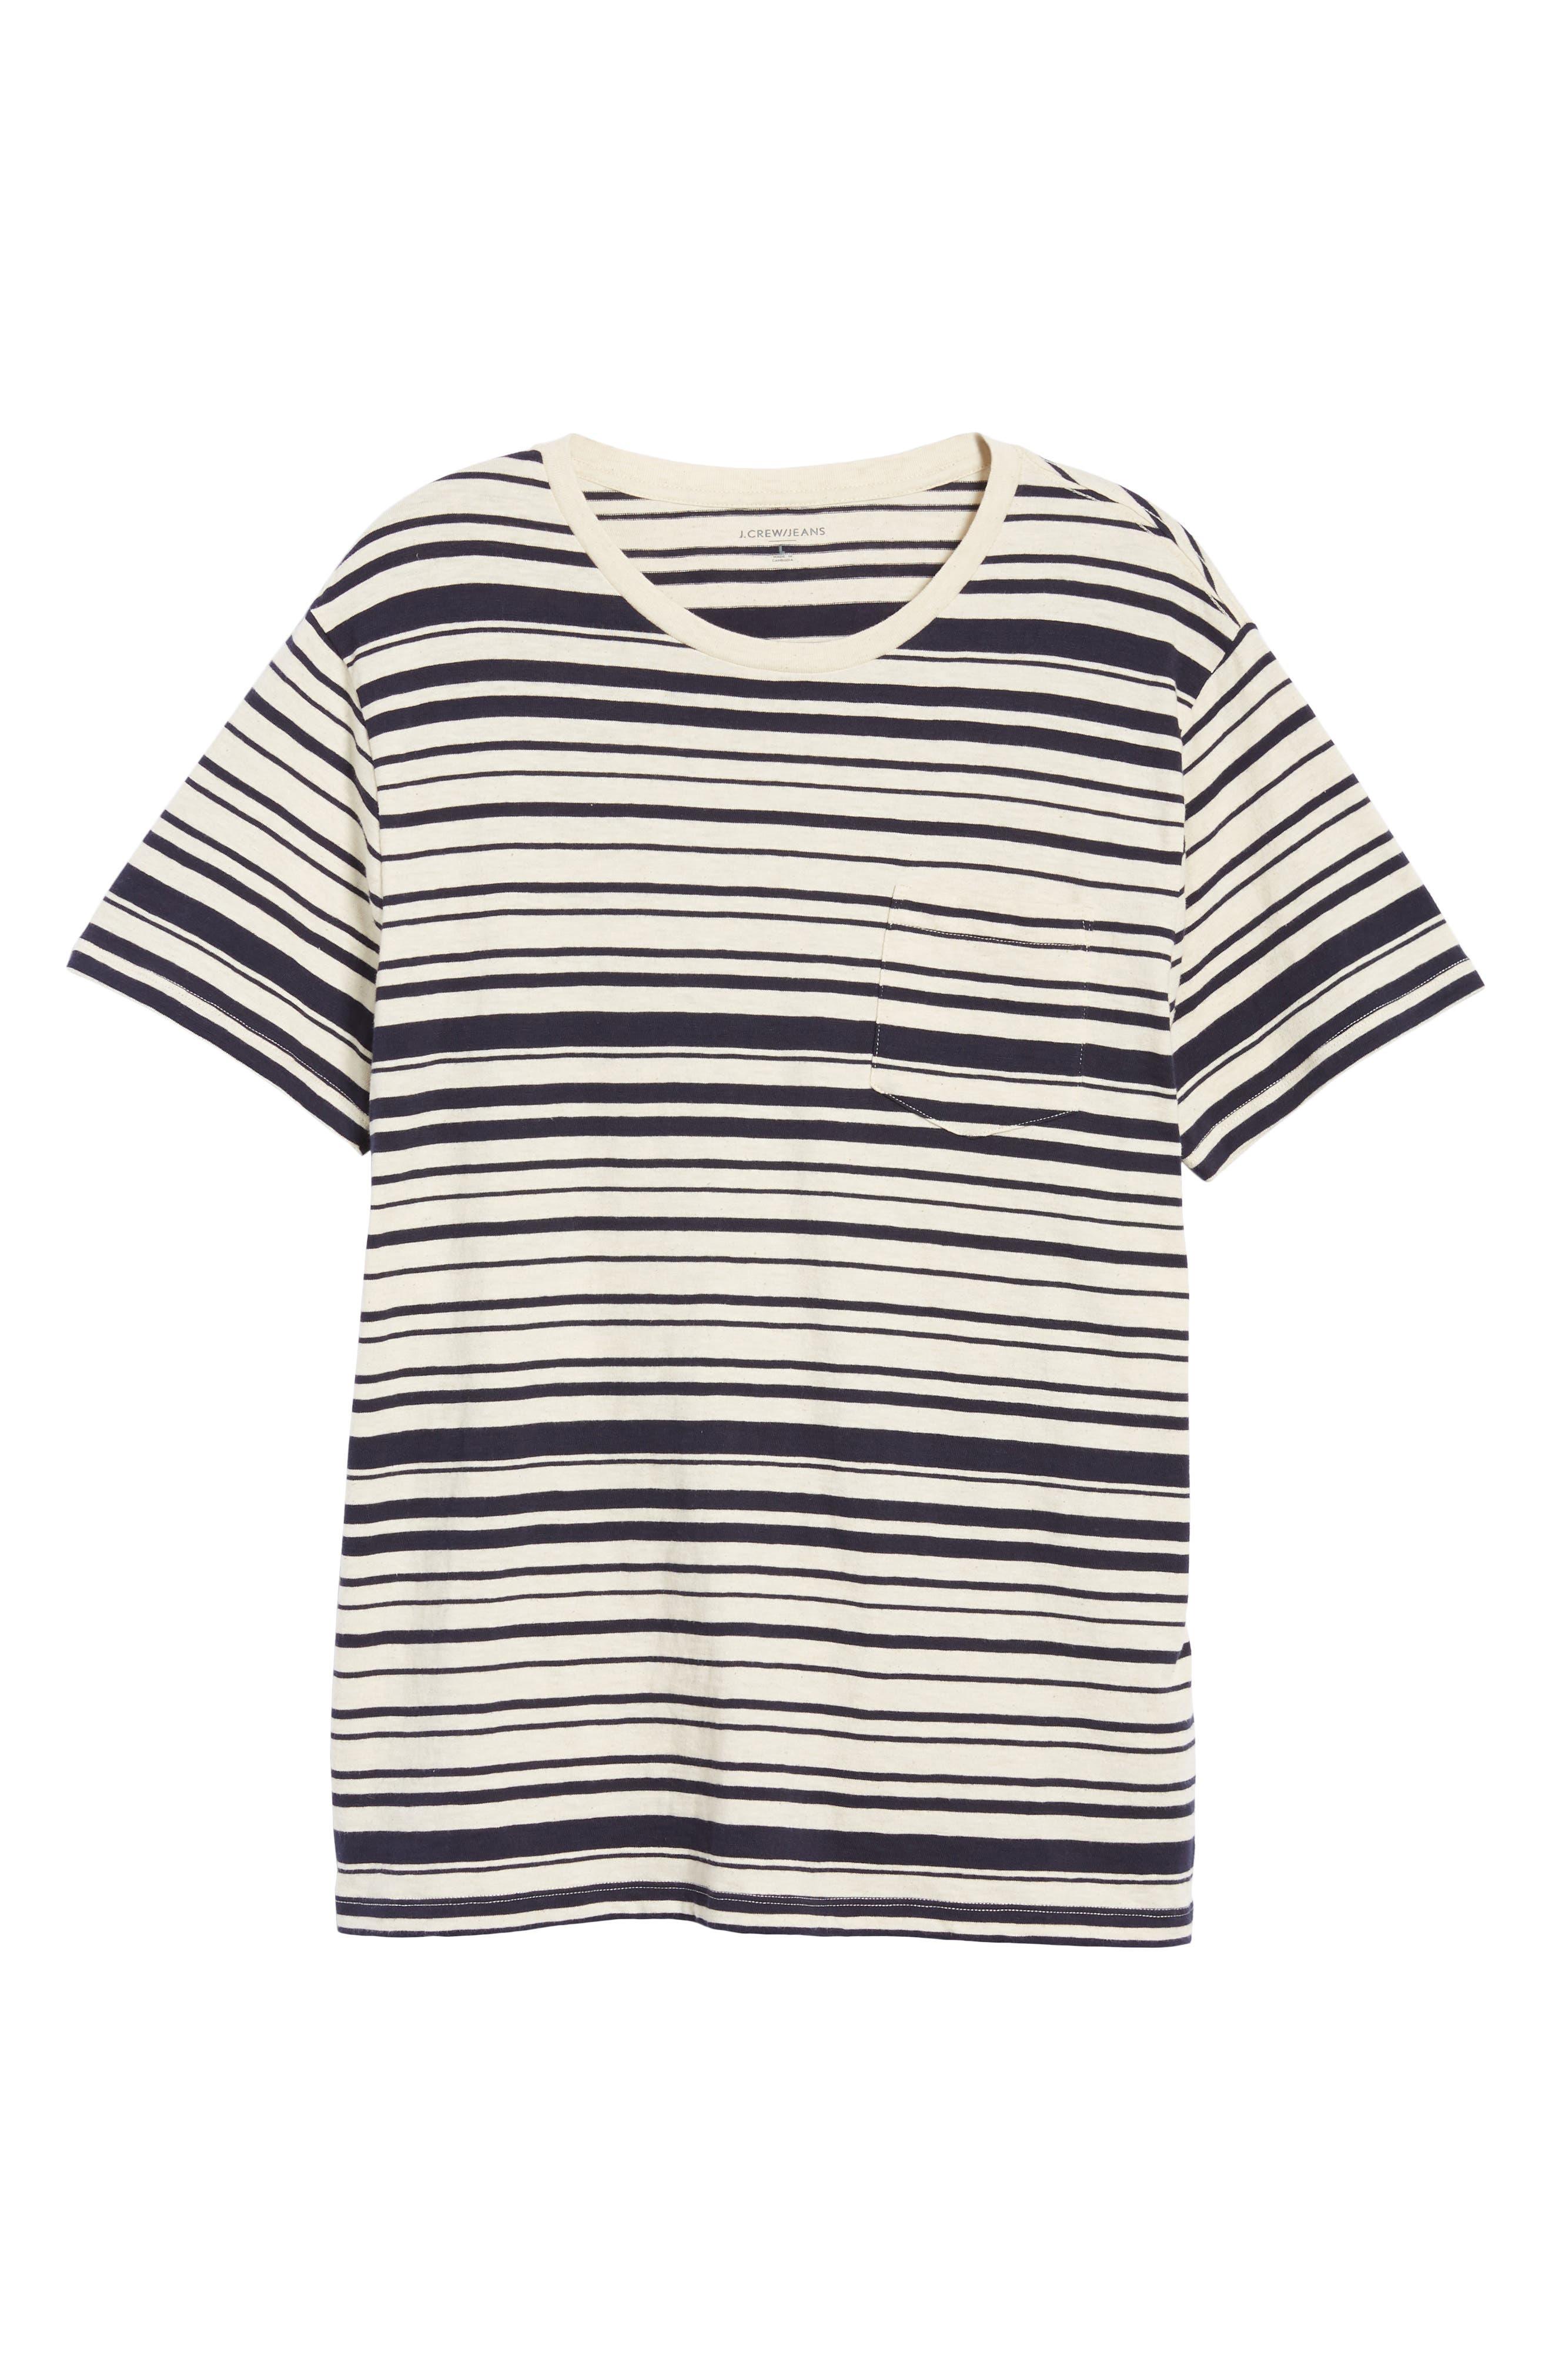 Variegated Stripe Slub Cotton T-Shirt,                             Alternate thumbnail 5, color,                             Ivory Navy